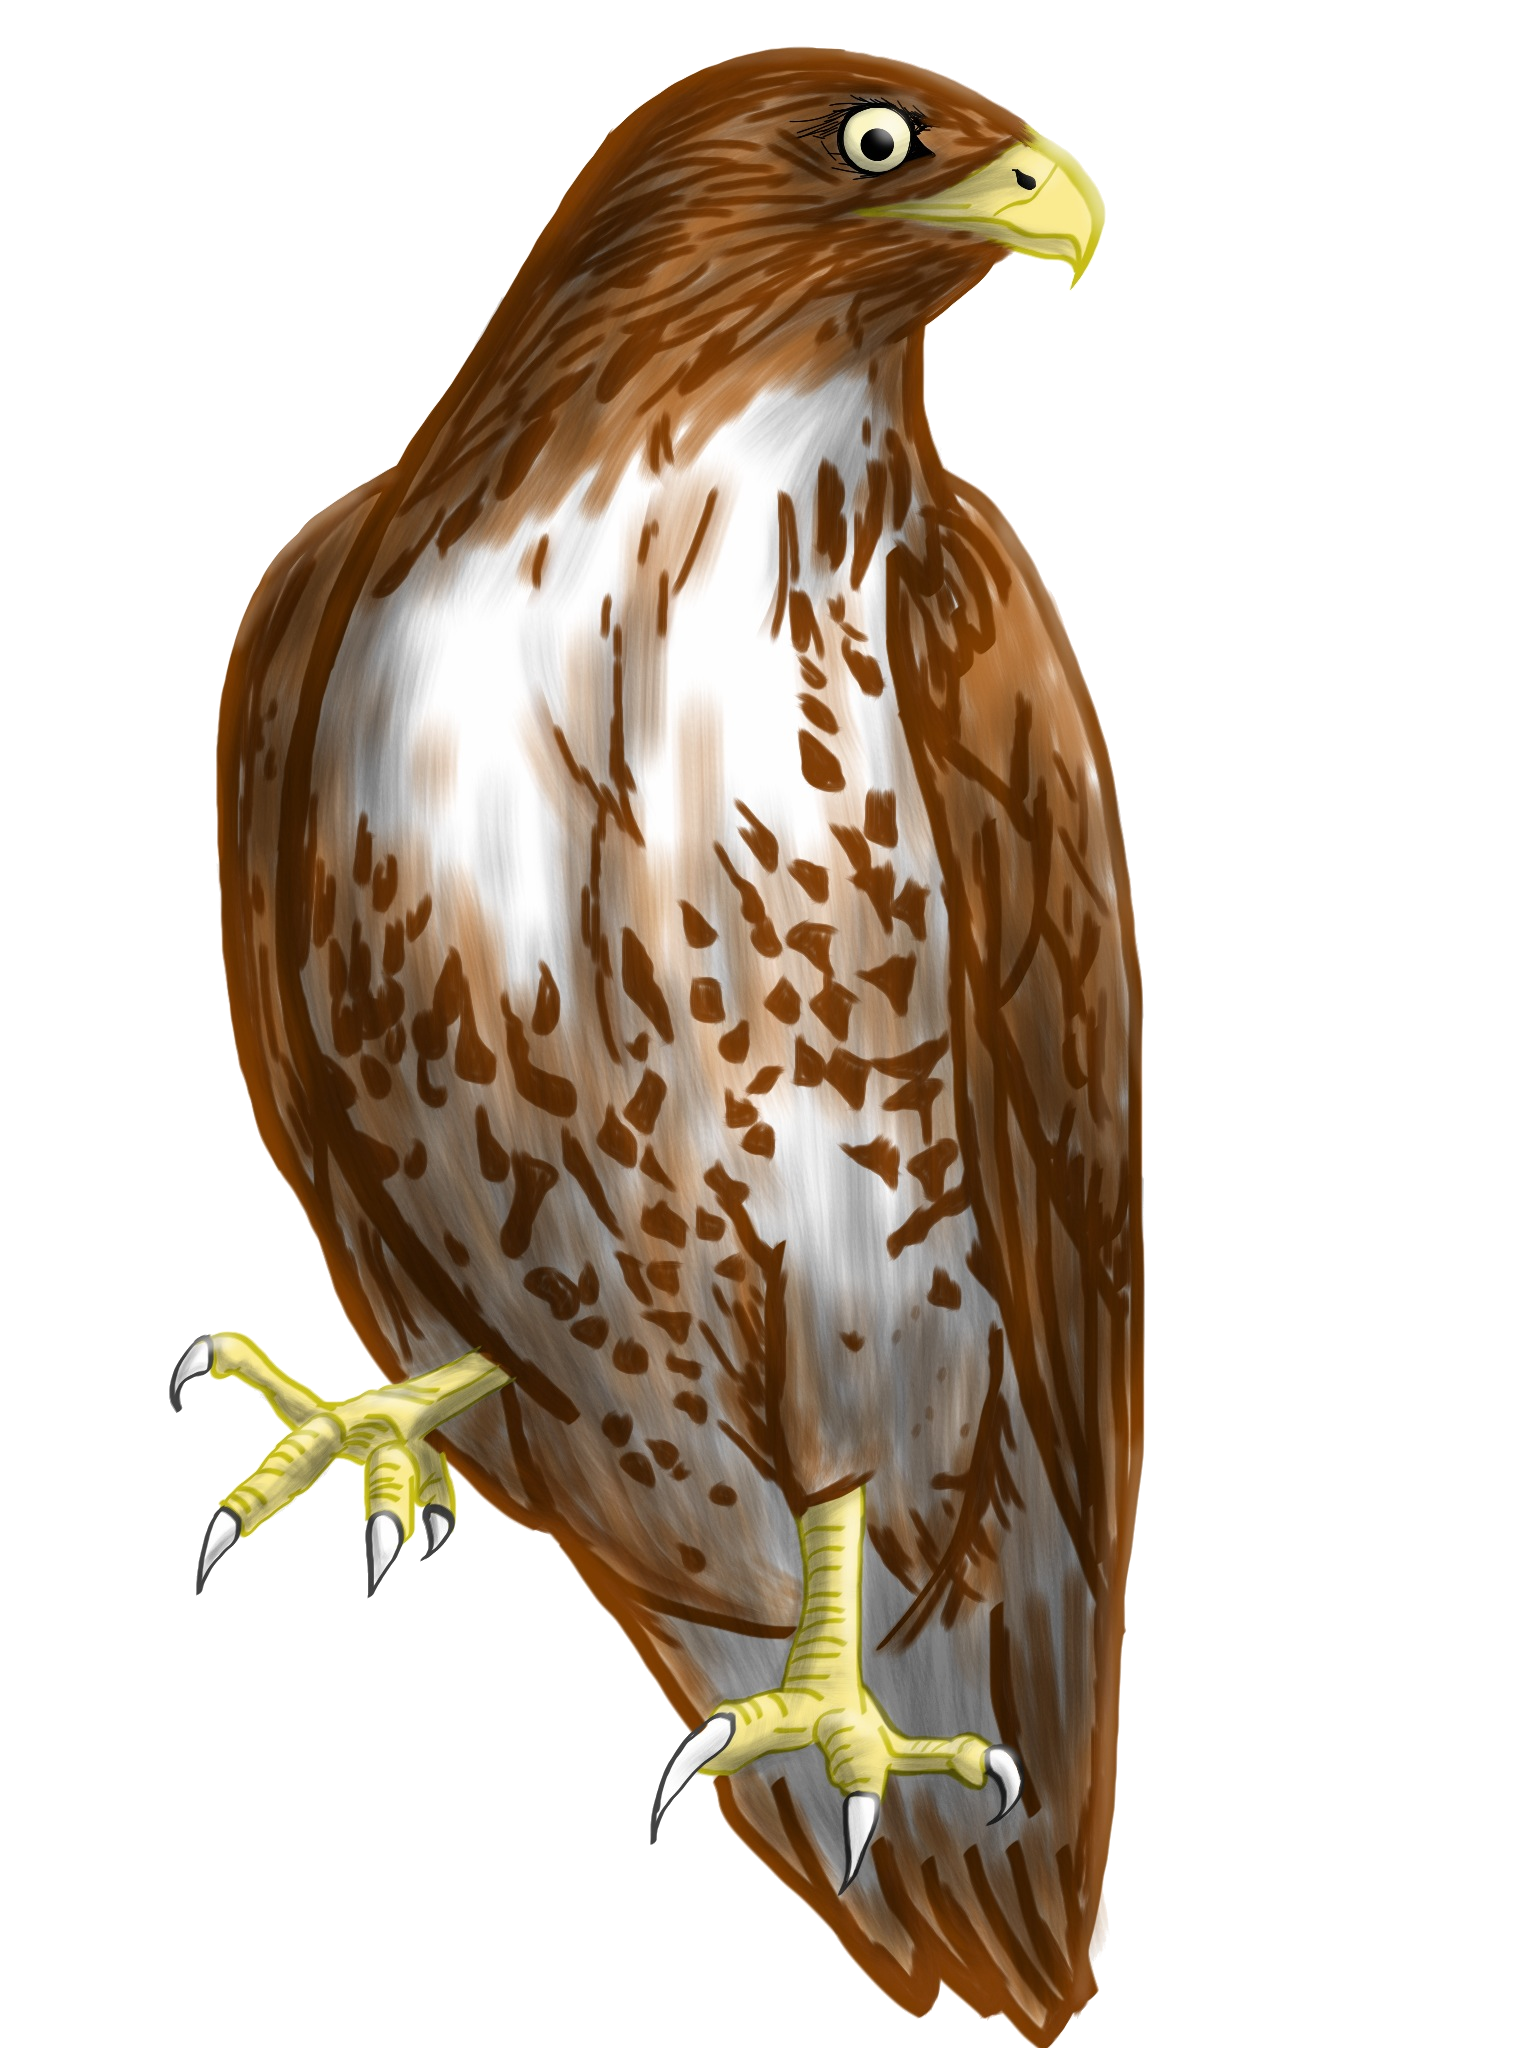 Cooper's Hawk clipart #10, Download drawings